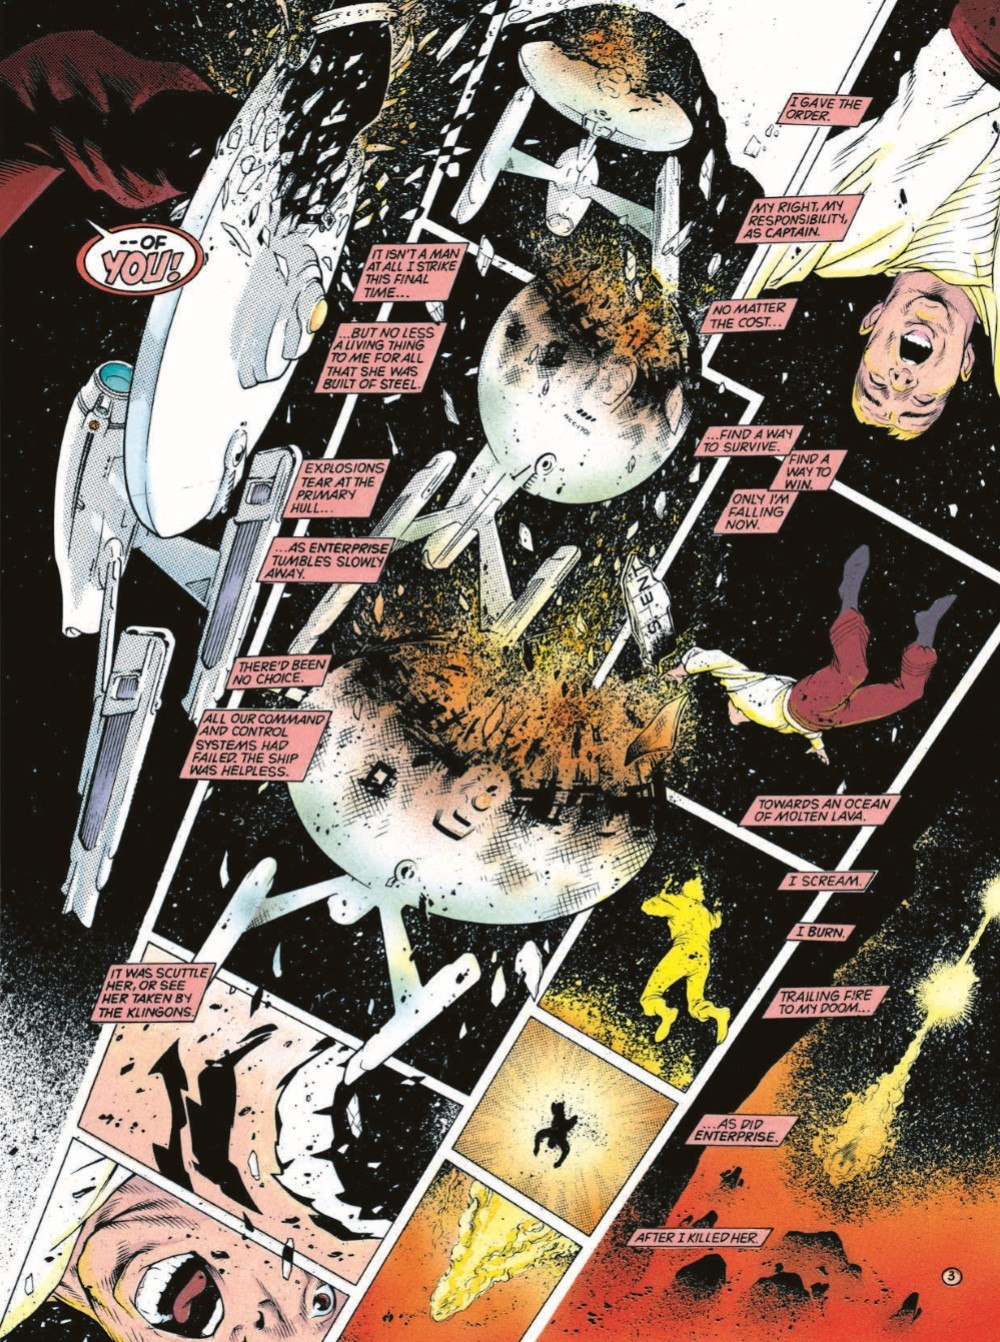 StarTrek_DebtofHonor-pr-6-1 ComicList Previews: STAR TREK DEBT OF HONOR CLASSIC EDITION GN